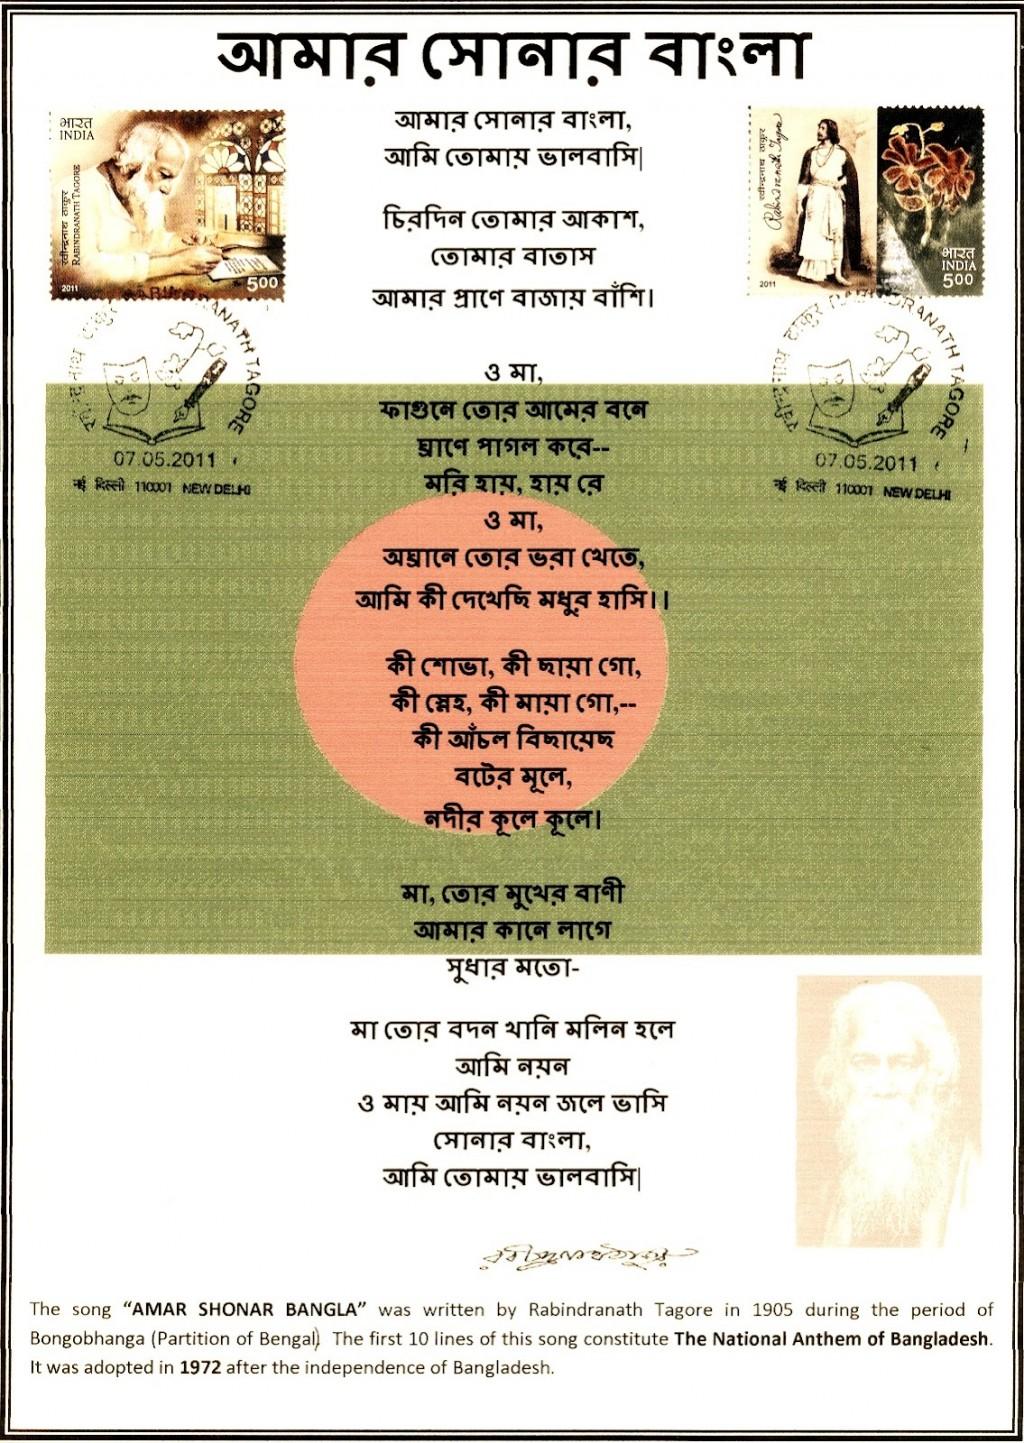 008 Rabindra Nath Tagore Amar Shonar Bangla Essay On Bhagat Singh In Marathi Unique Short 100 Words Large